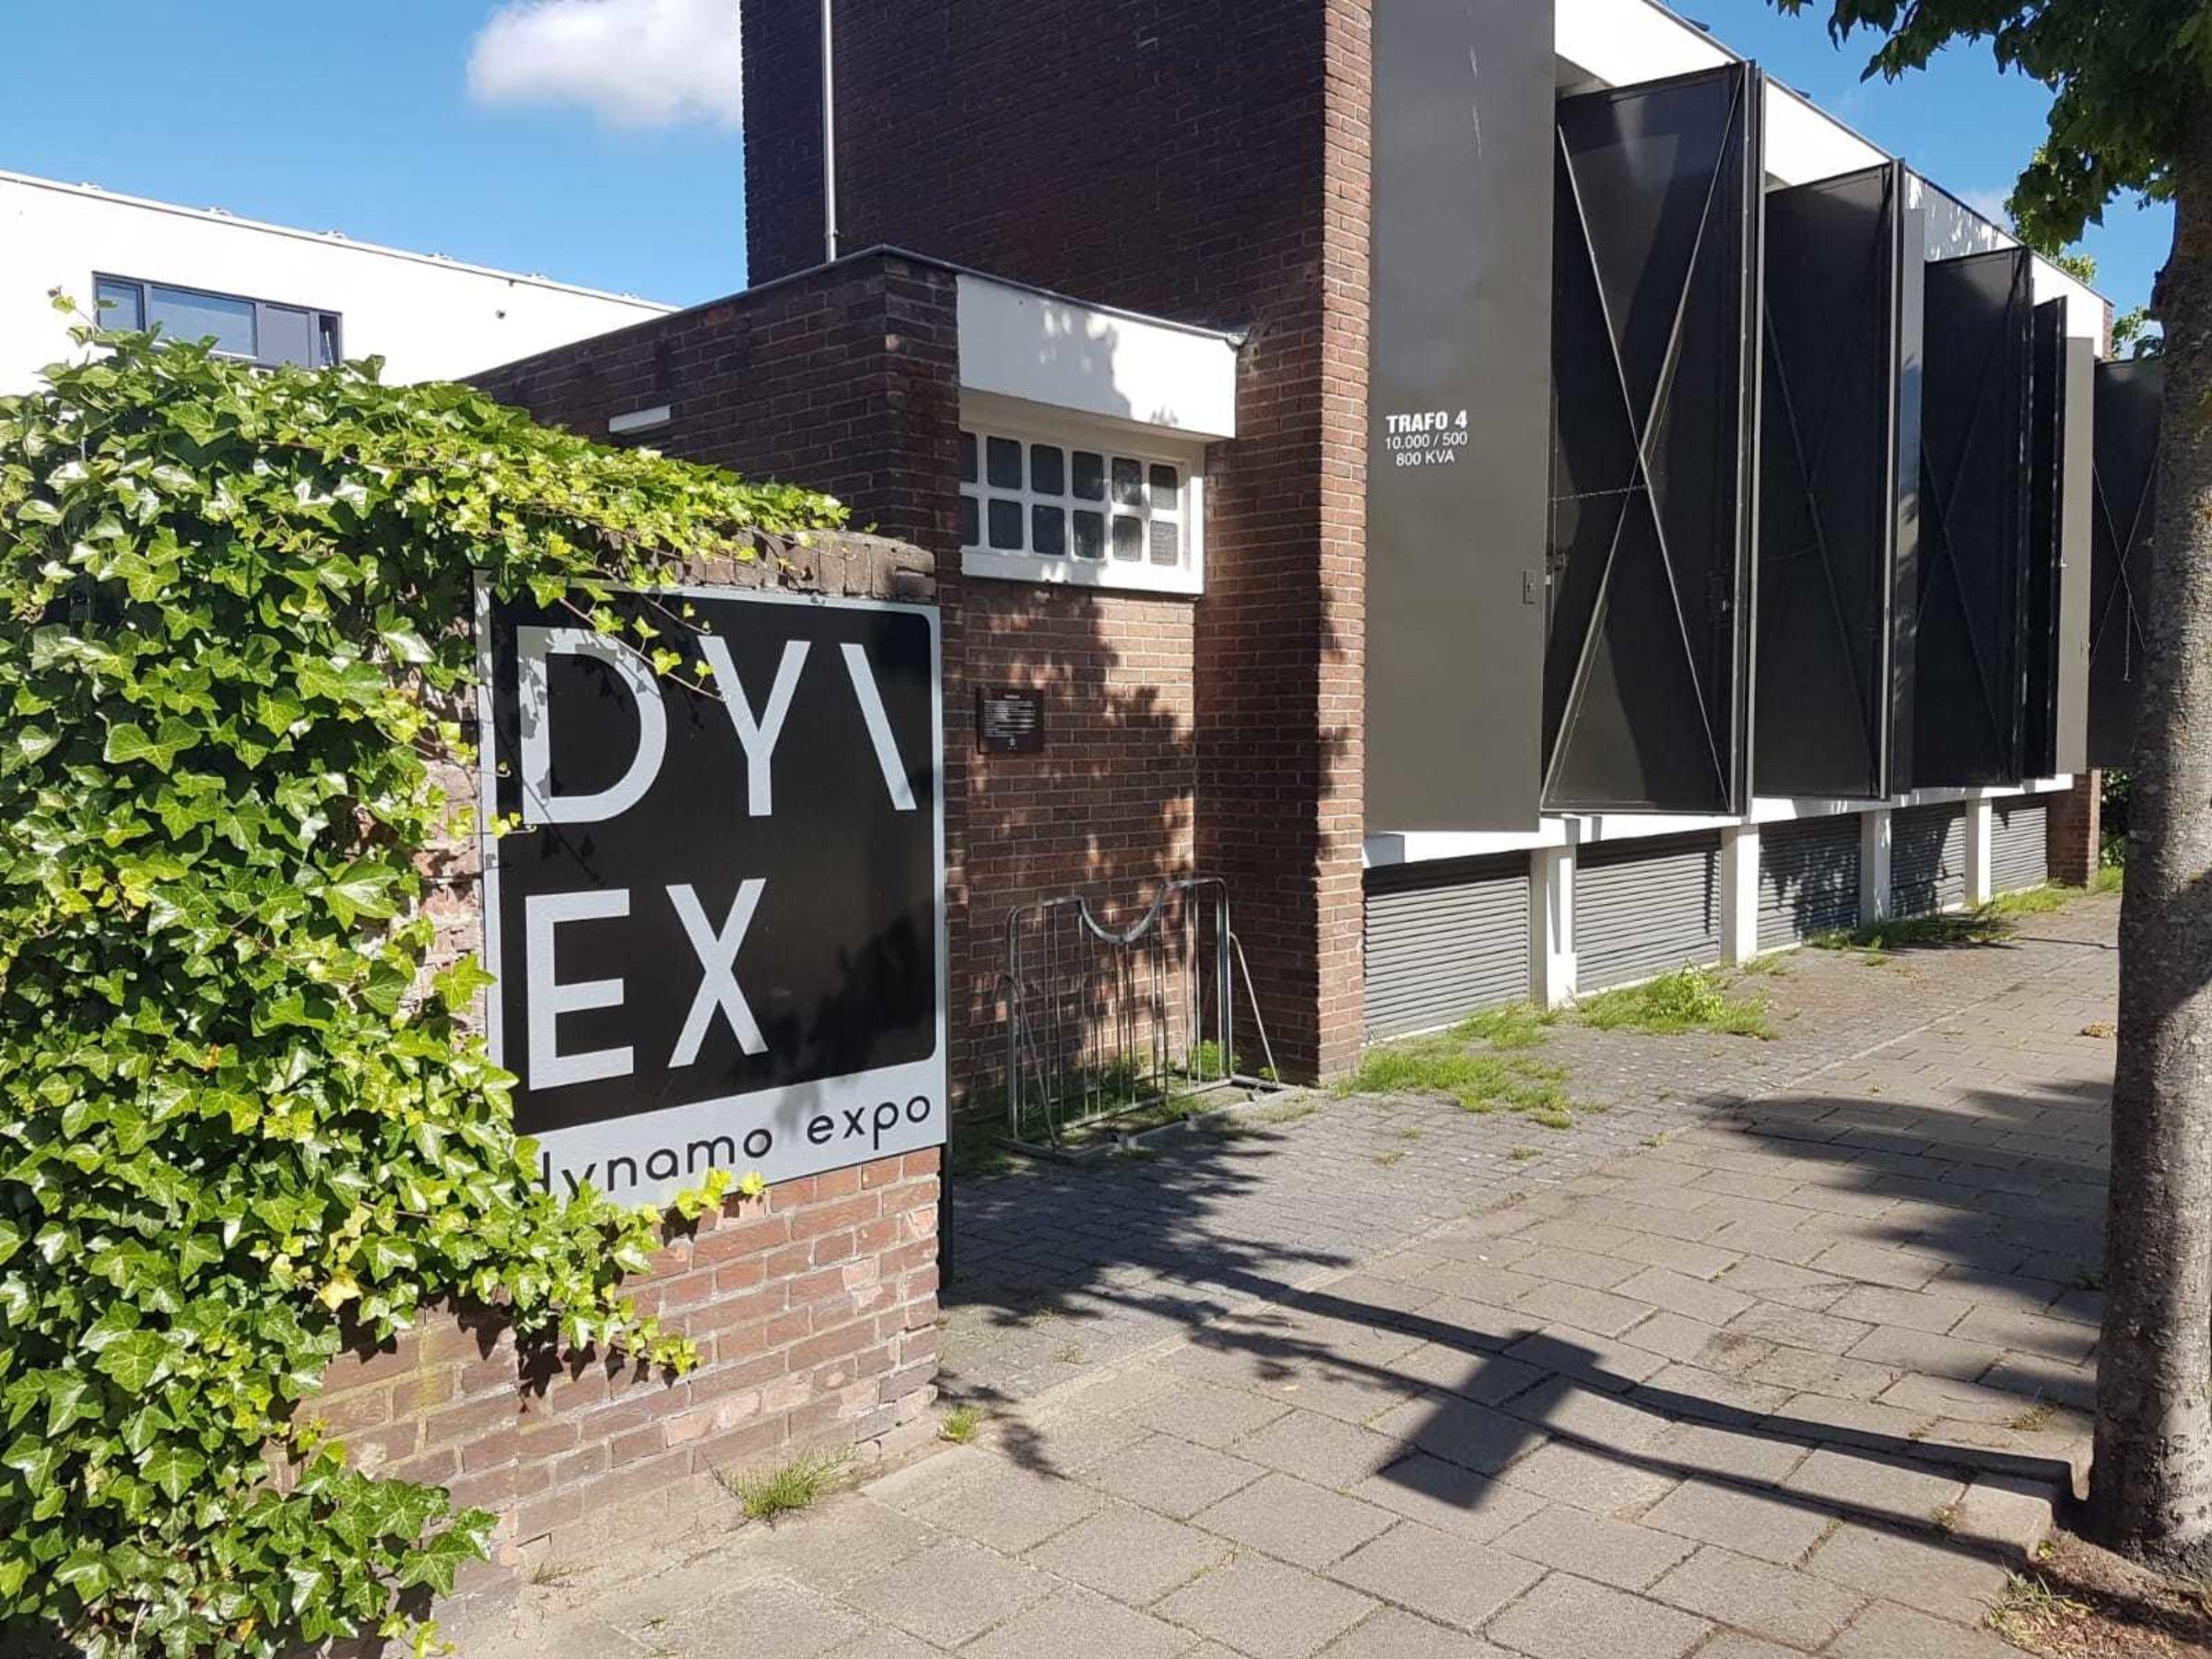 2019 Dynamo Expo